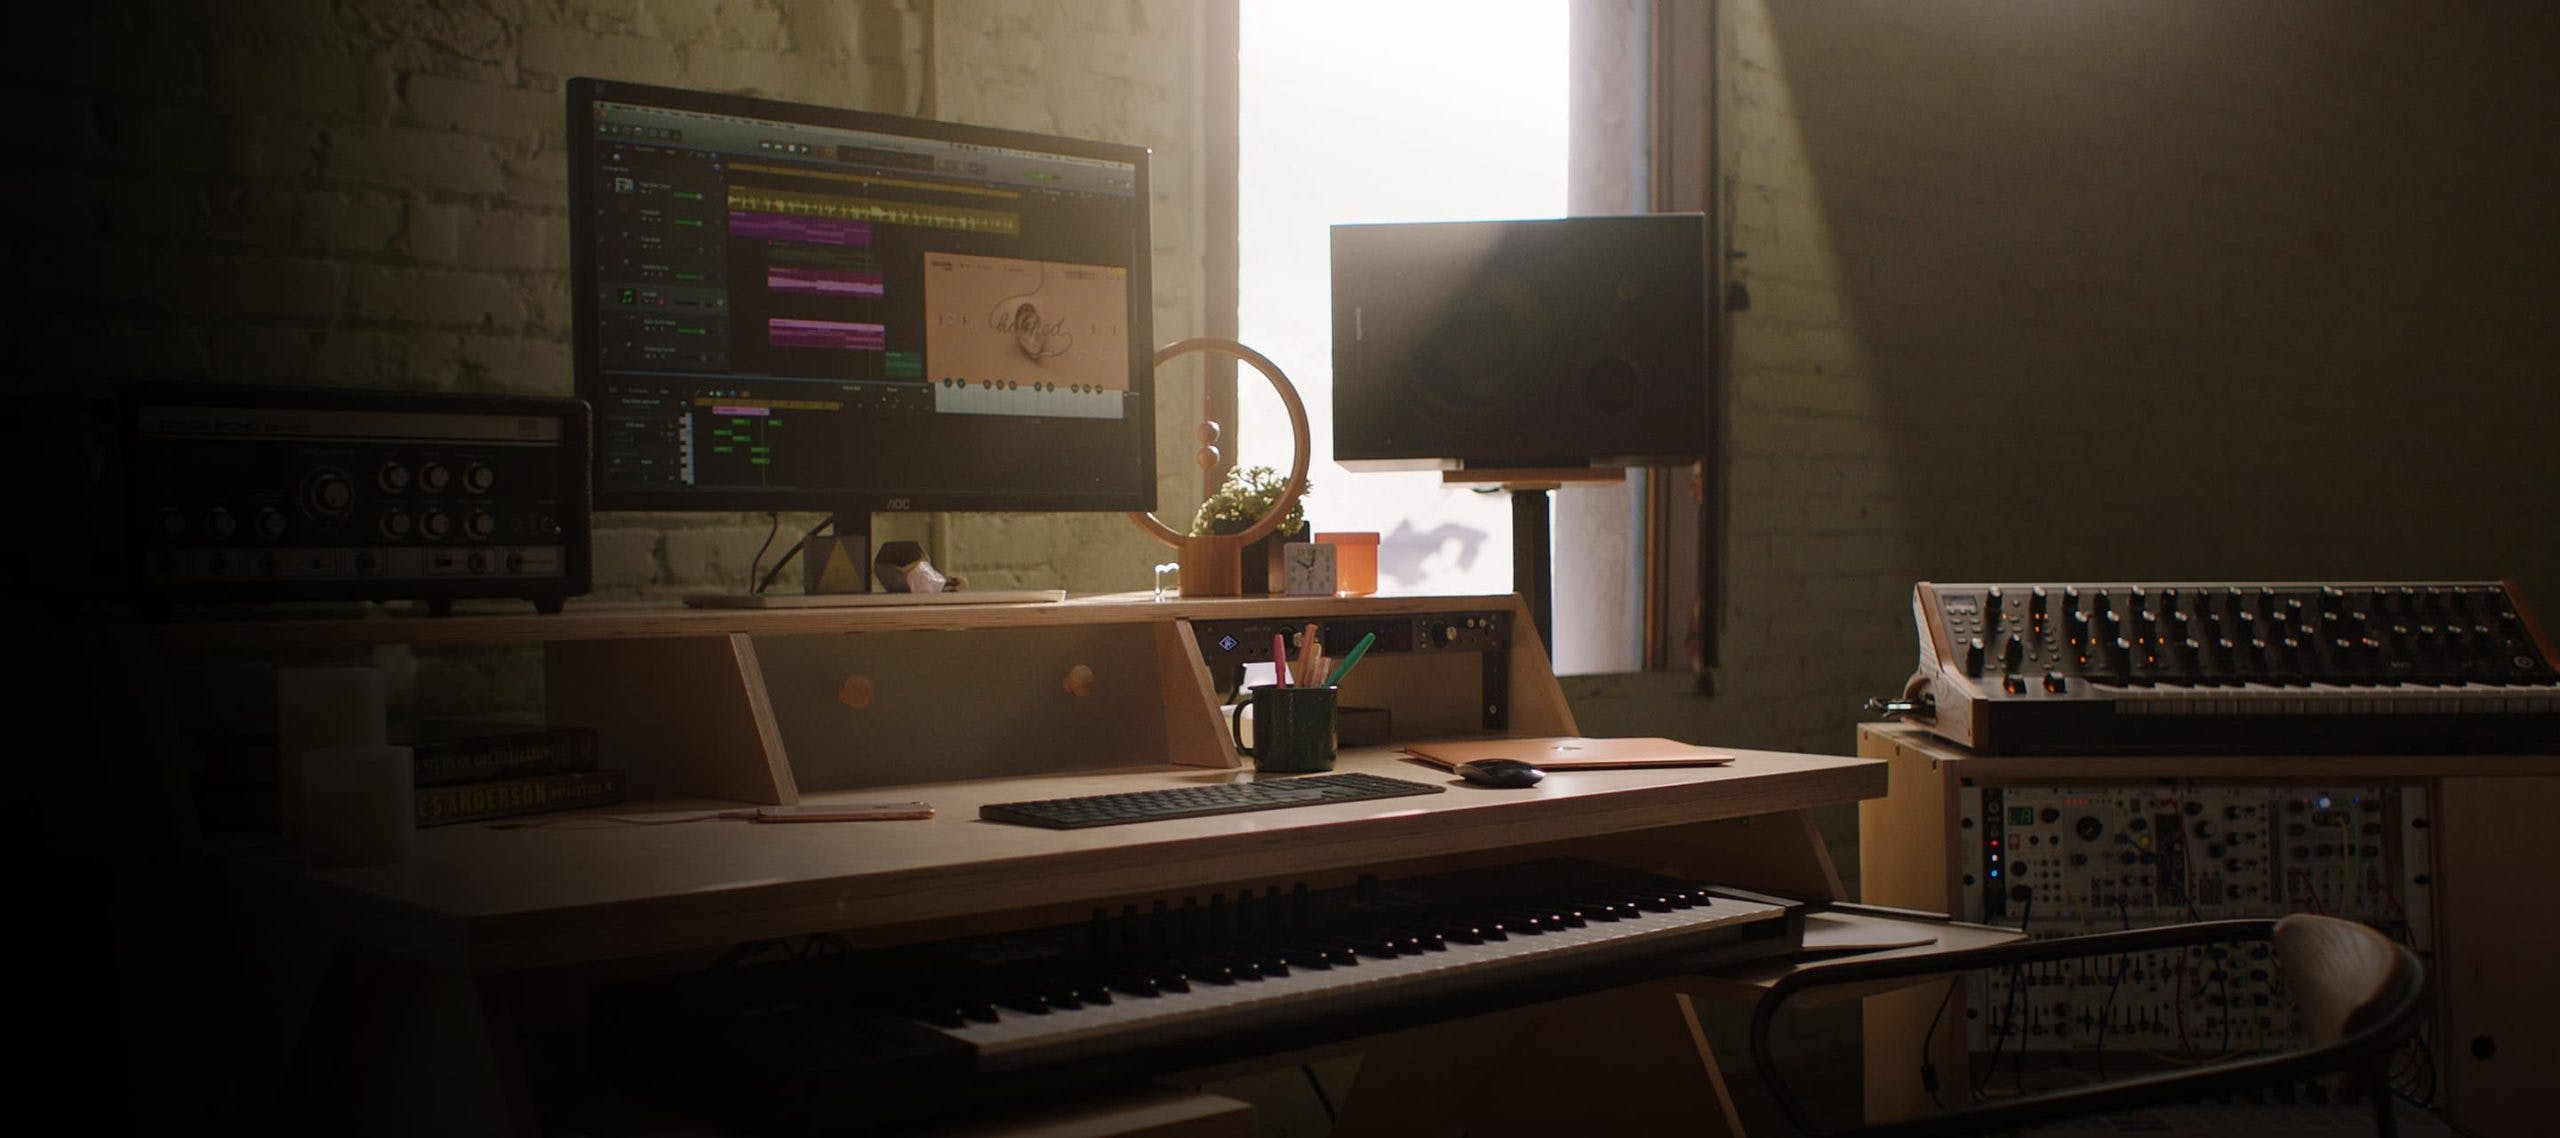 Studio setup with natural color Output Platform desk and natural color Output Sidecar accessory.